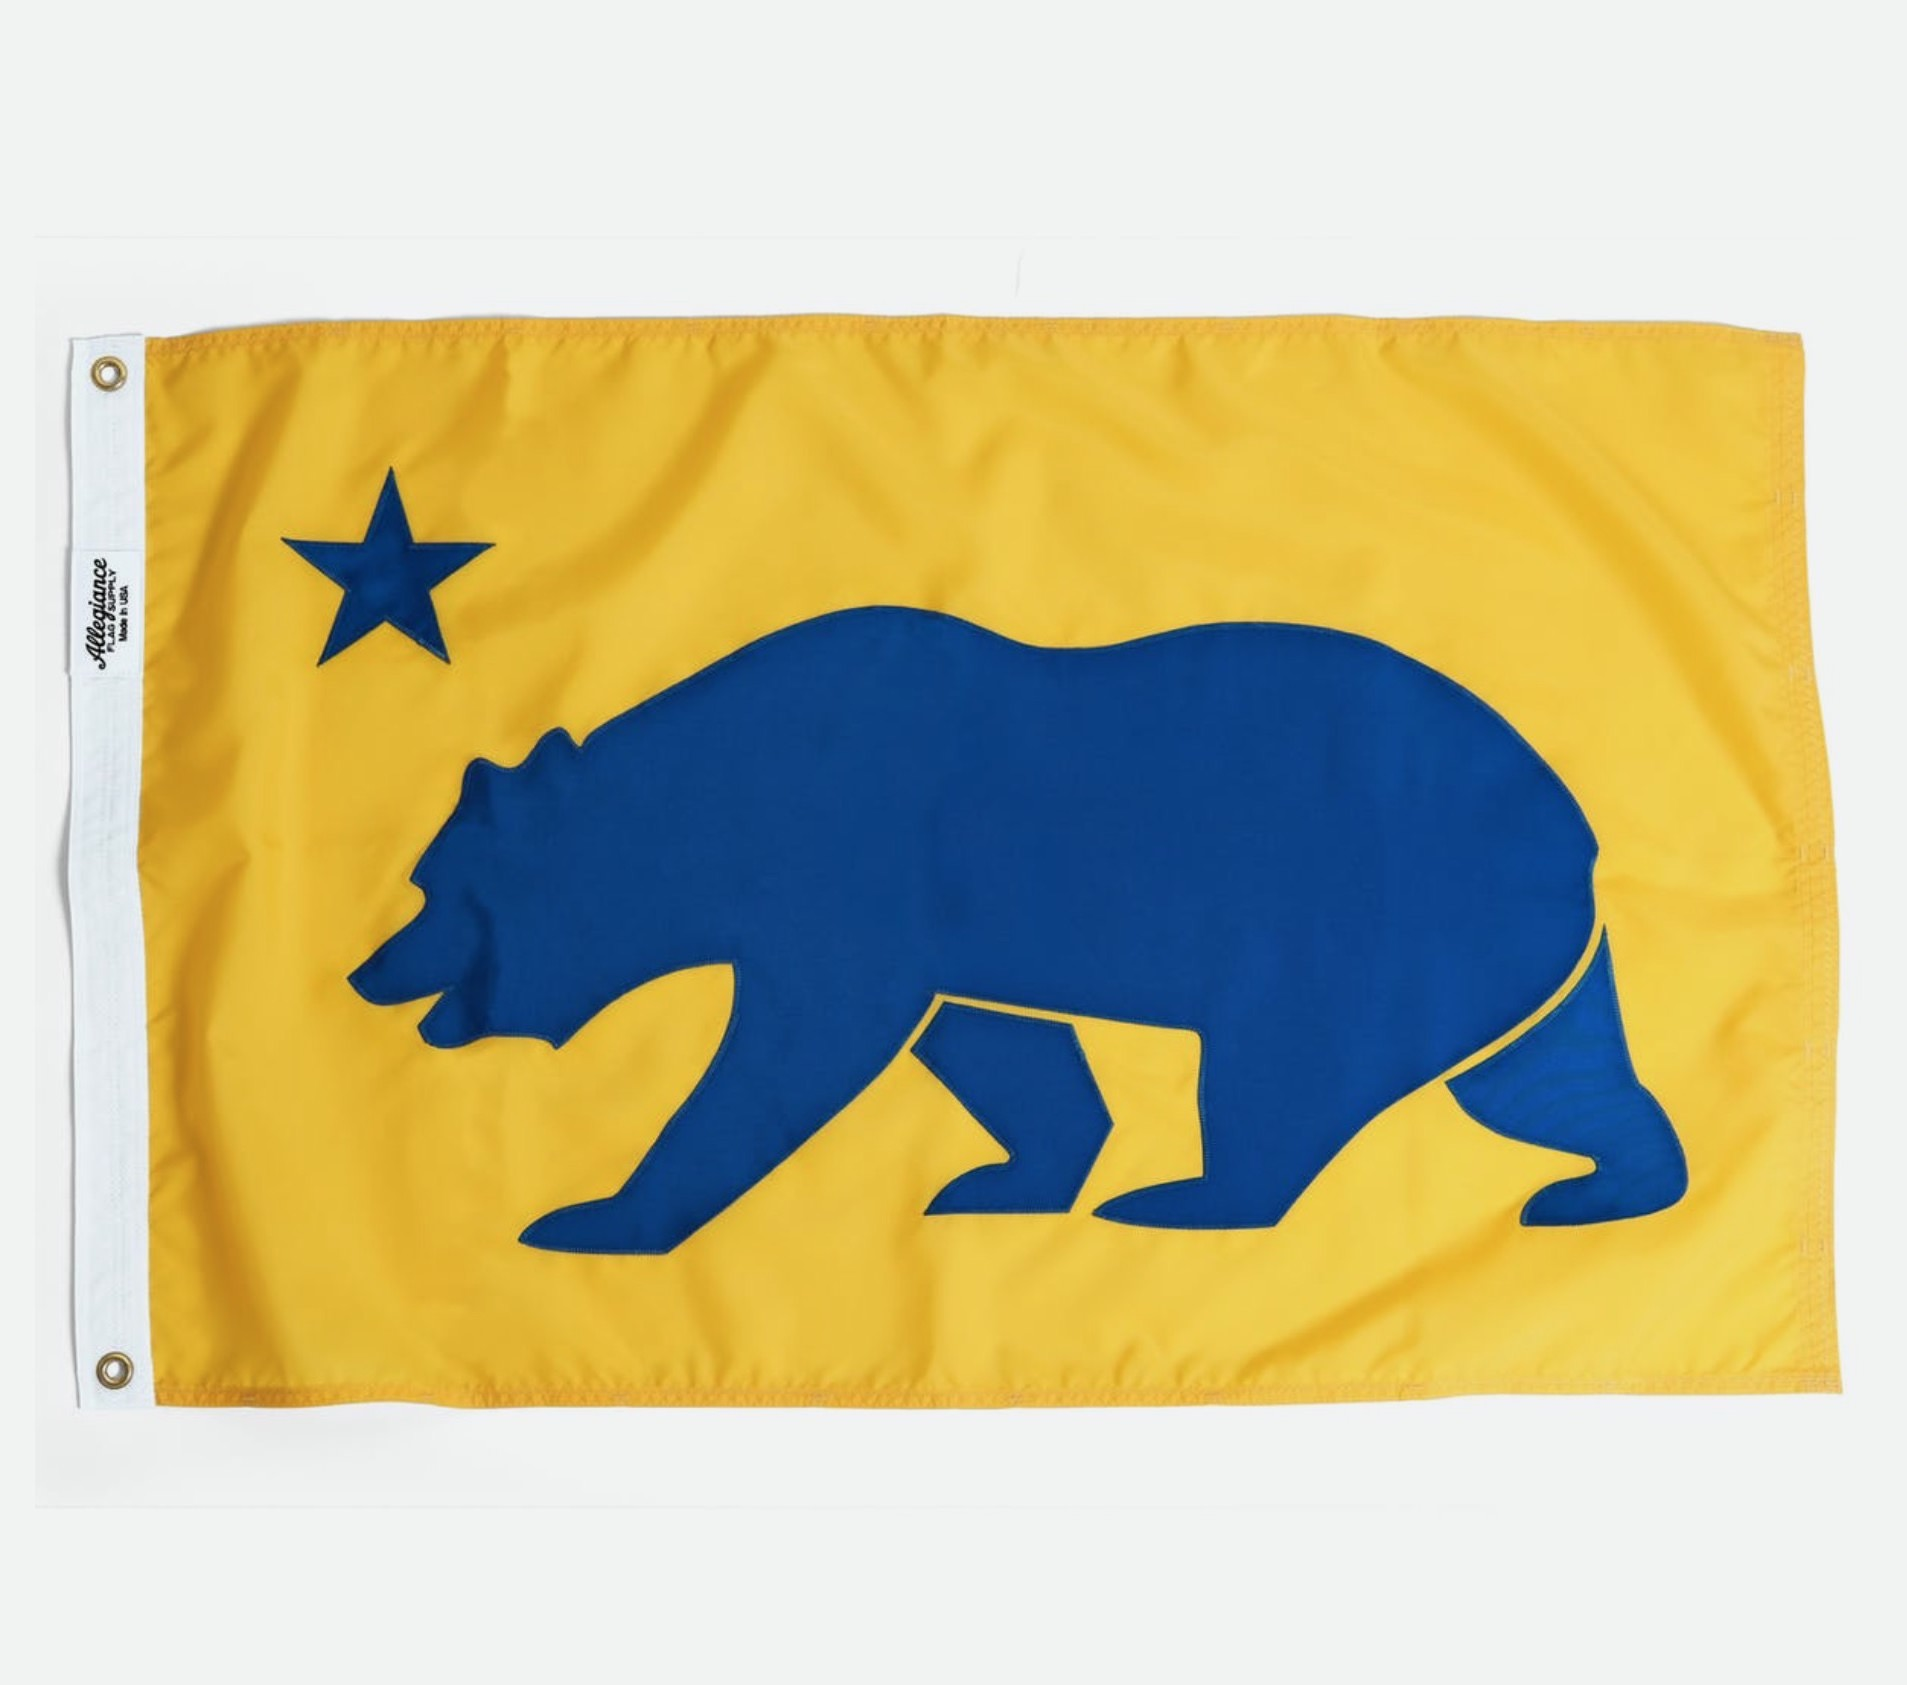 Allegiance Flags